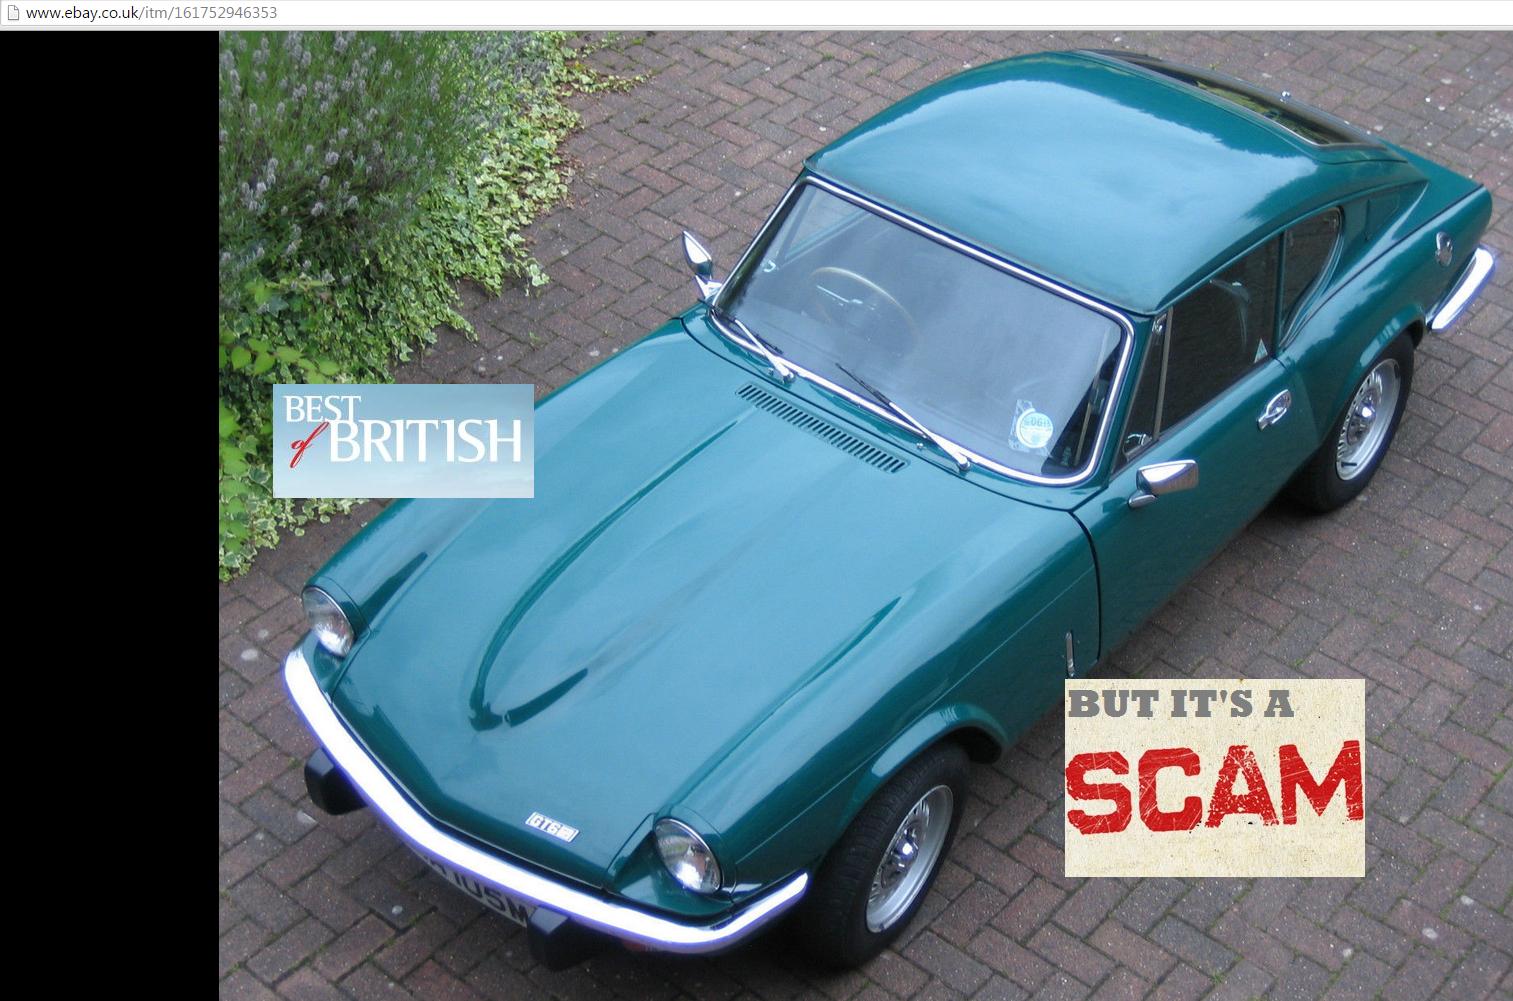 Jack Buster Jack Ebay Scam 1973 Triumph Gt6 Mk3 2 0 Straight Six Uma105m Classic Car Fraud Uma 105m 04 Jul 15